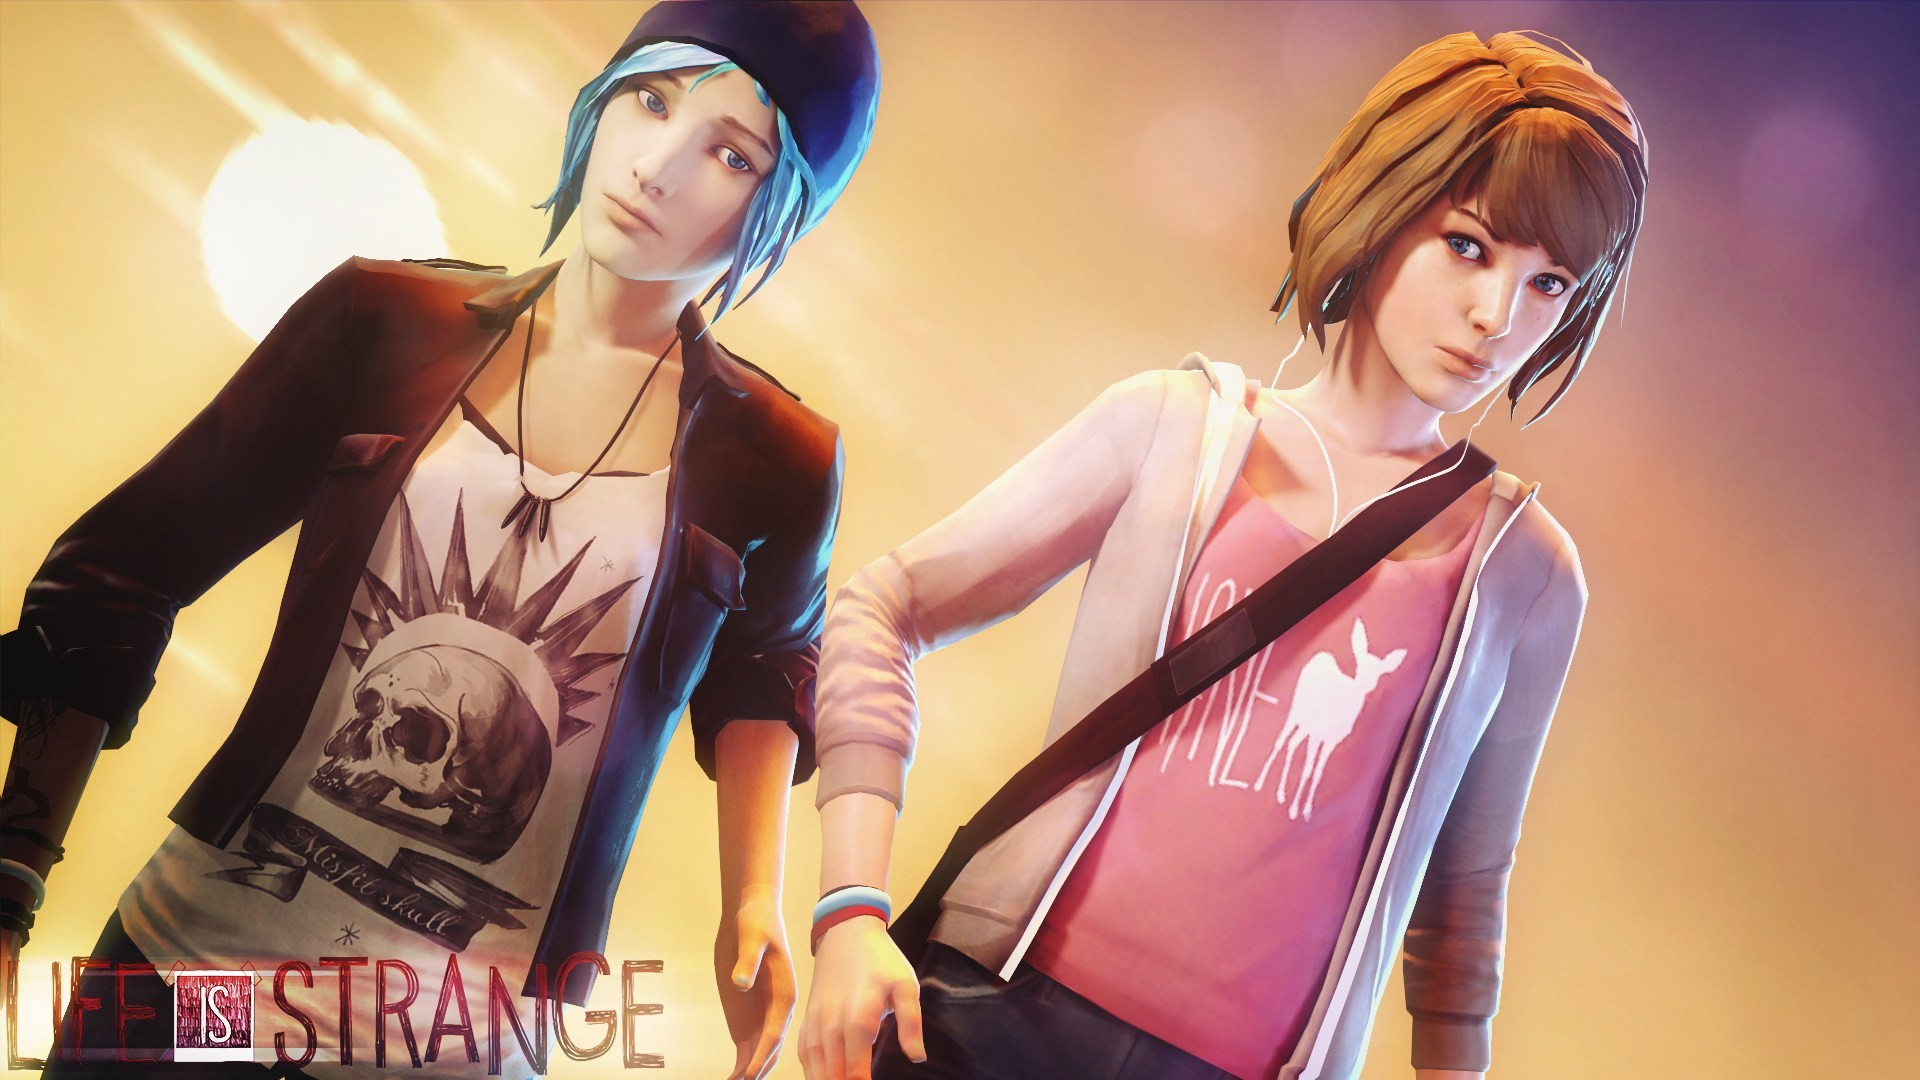 Res: 1920x1080, Max Caulfield Life is Strange Chloe Price 1080p HD Wallpaper Background